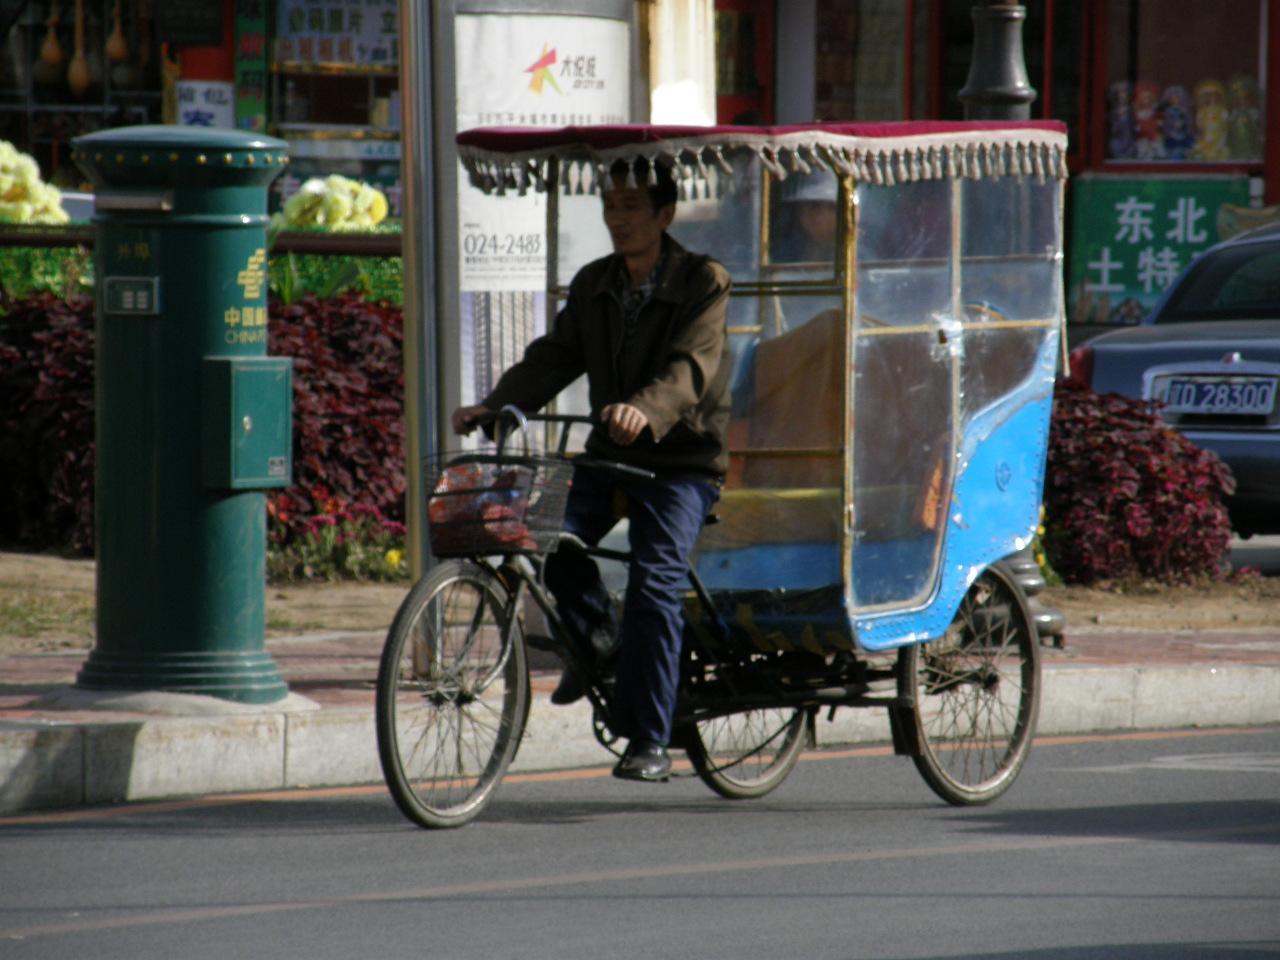 China Street Food Uption